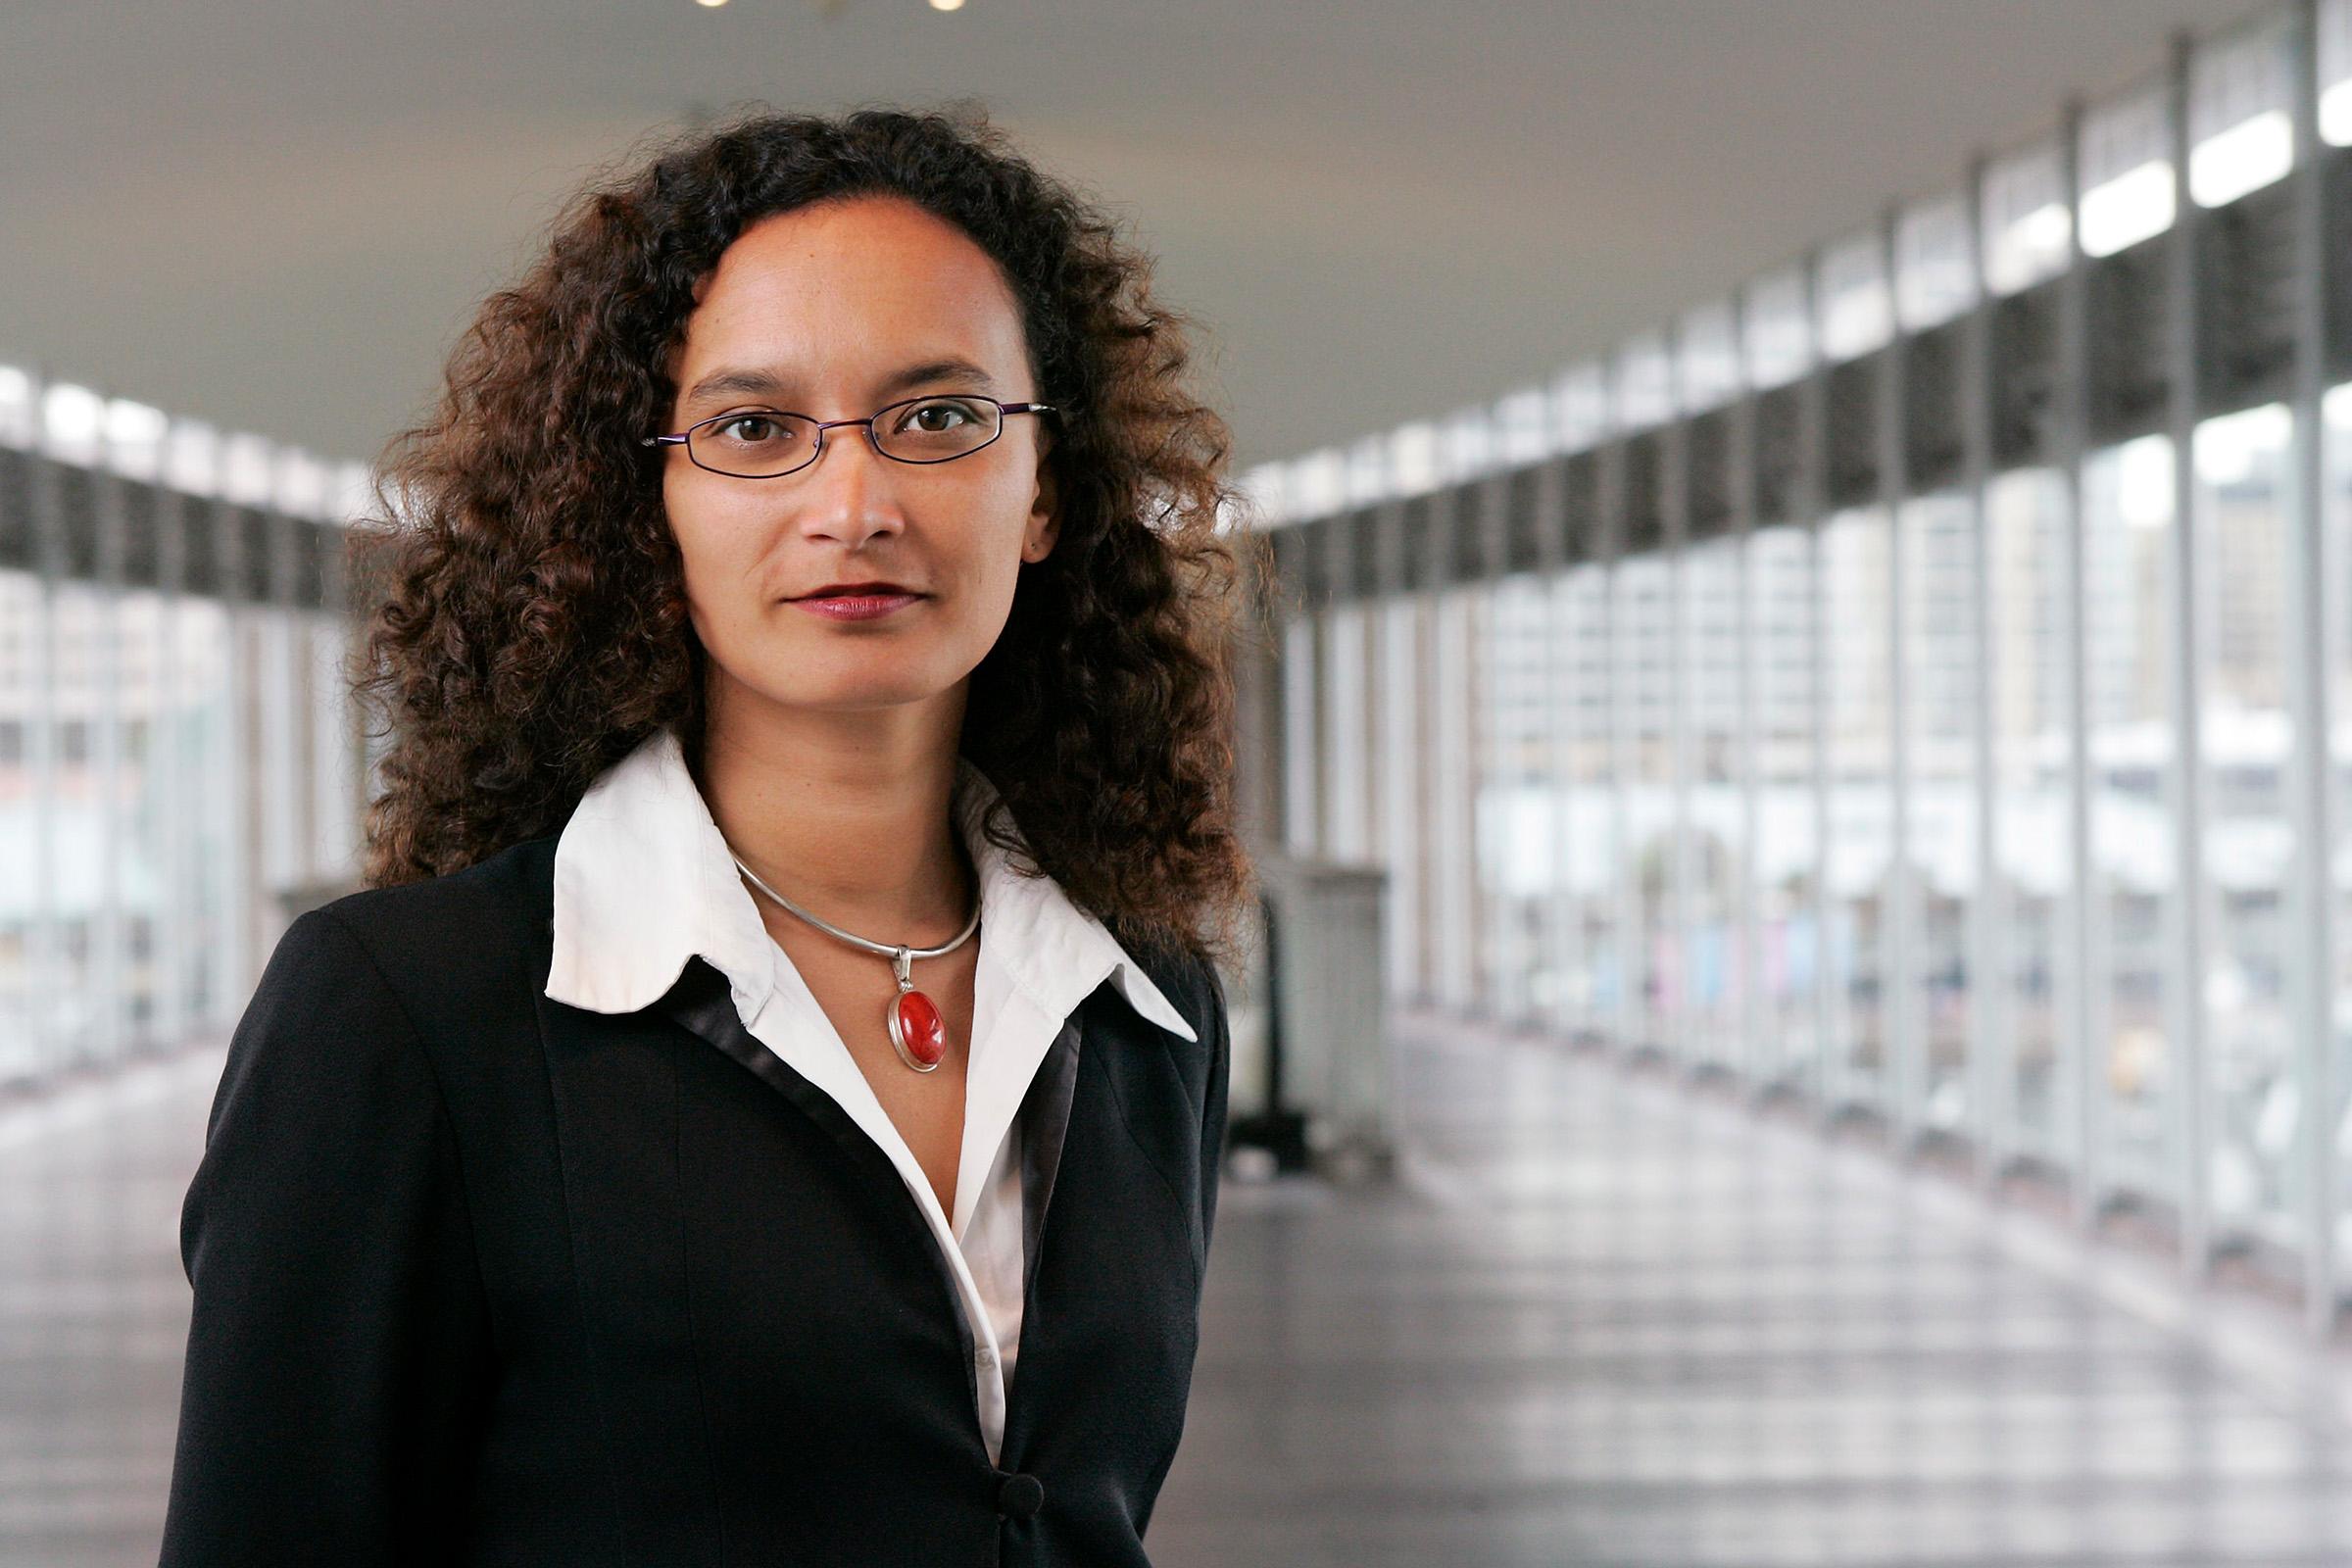 Corporate environmental location portrait photography PWC female black and white business attire